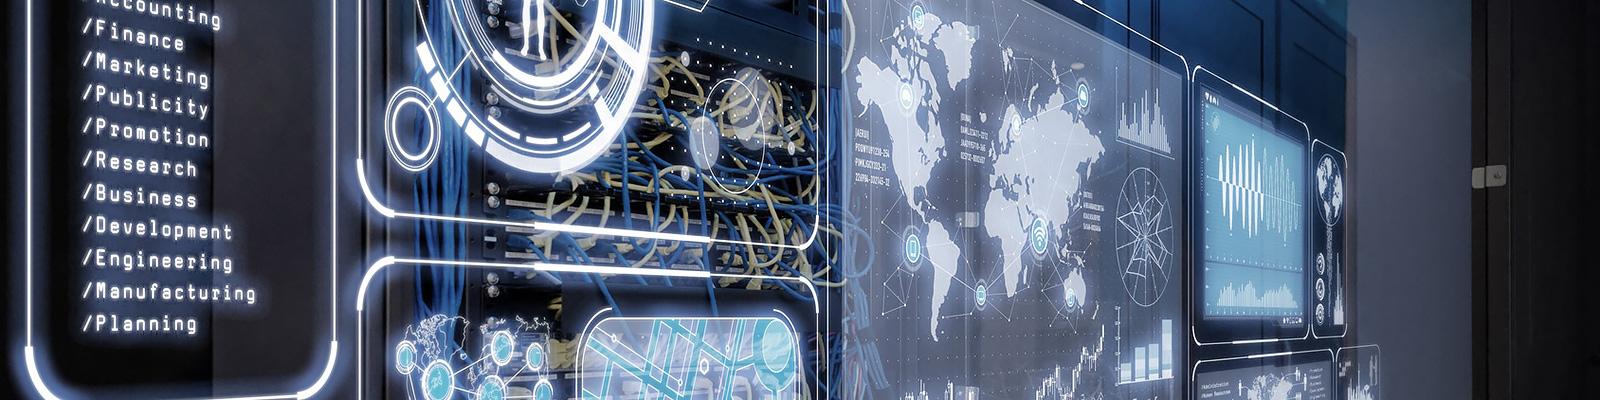 IoT セキュリティー イメージ